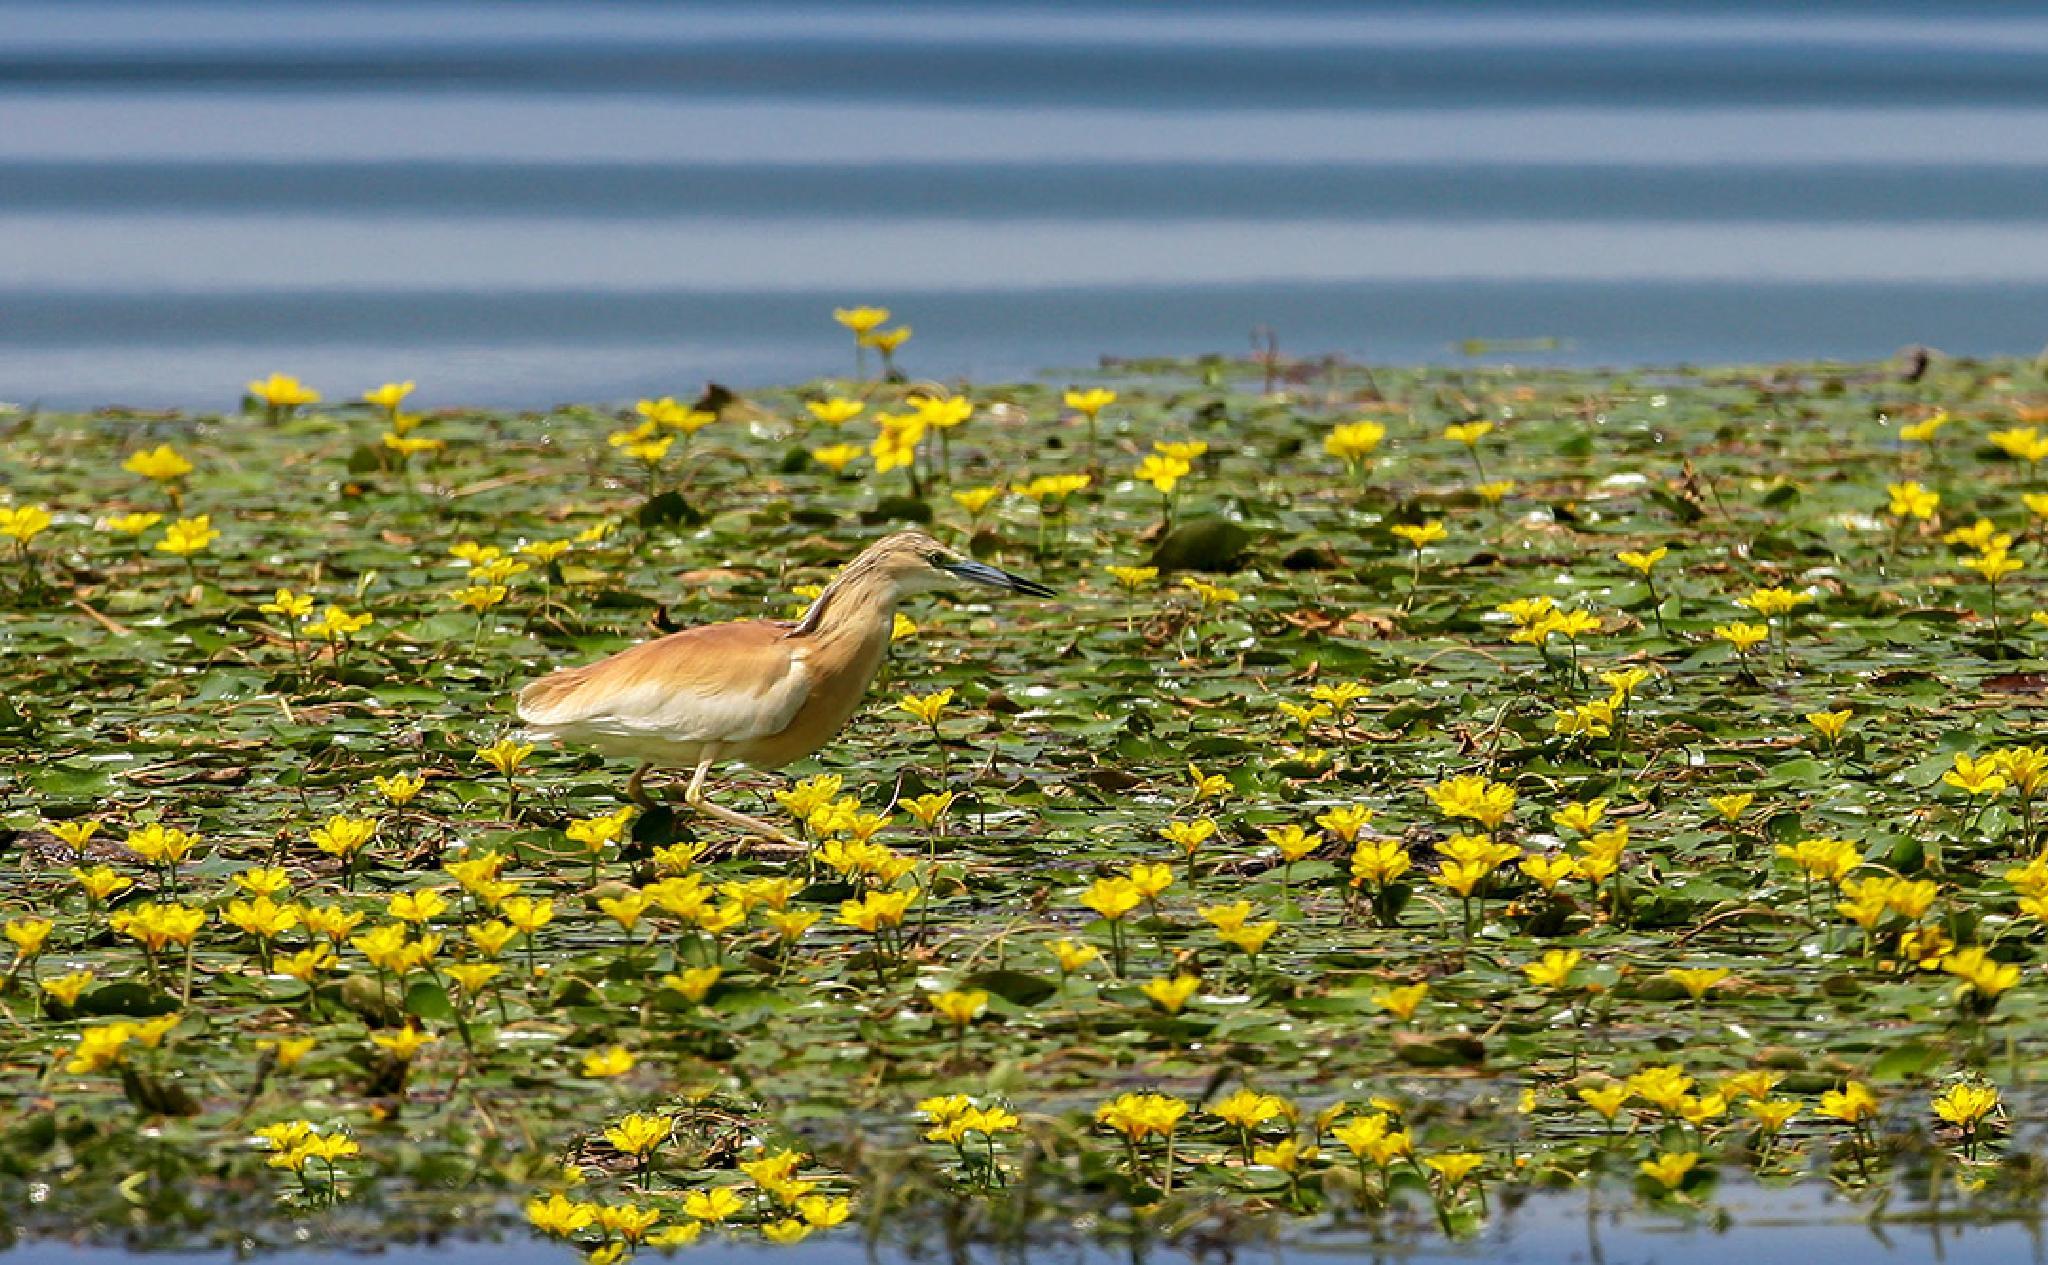 The squacco heron (Ardeola ralloides) by Sotiris Siomis